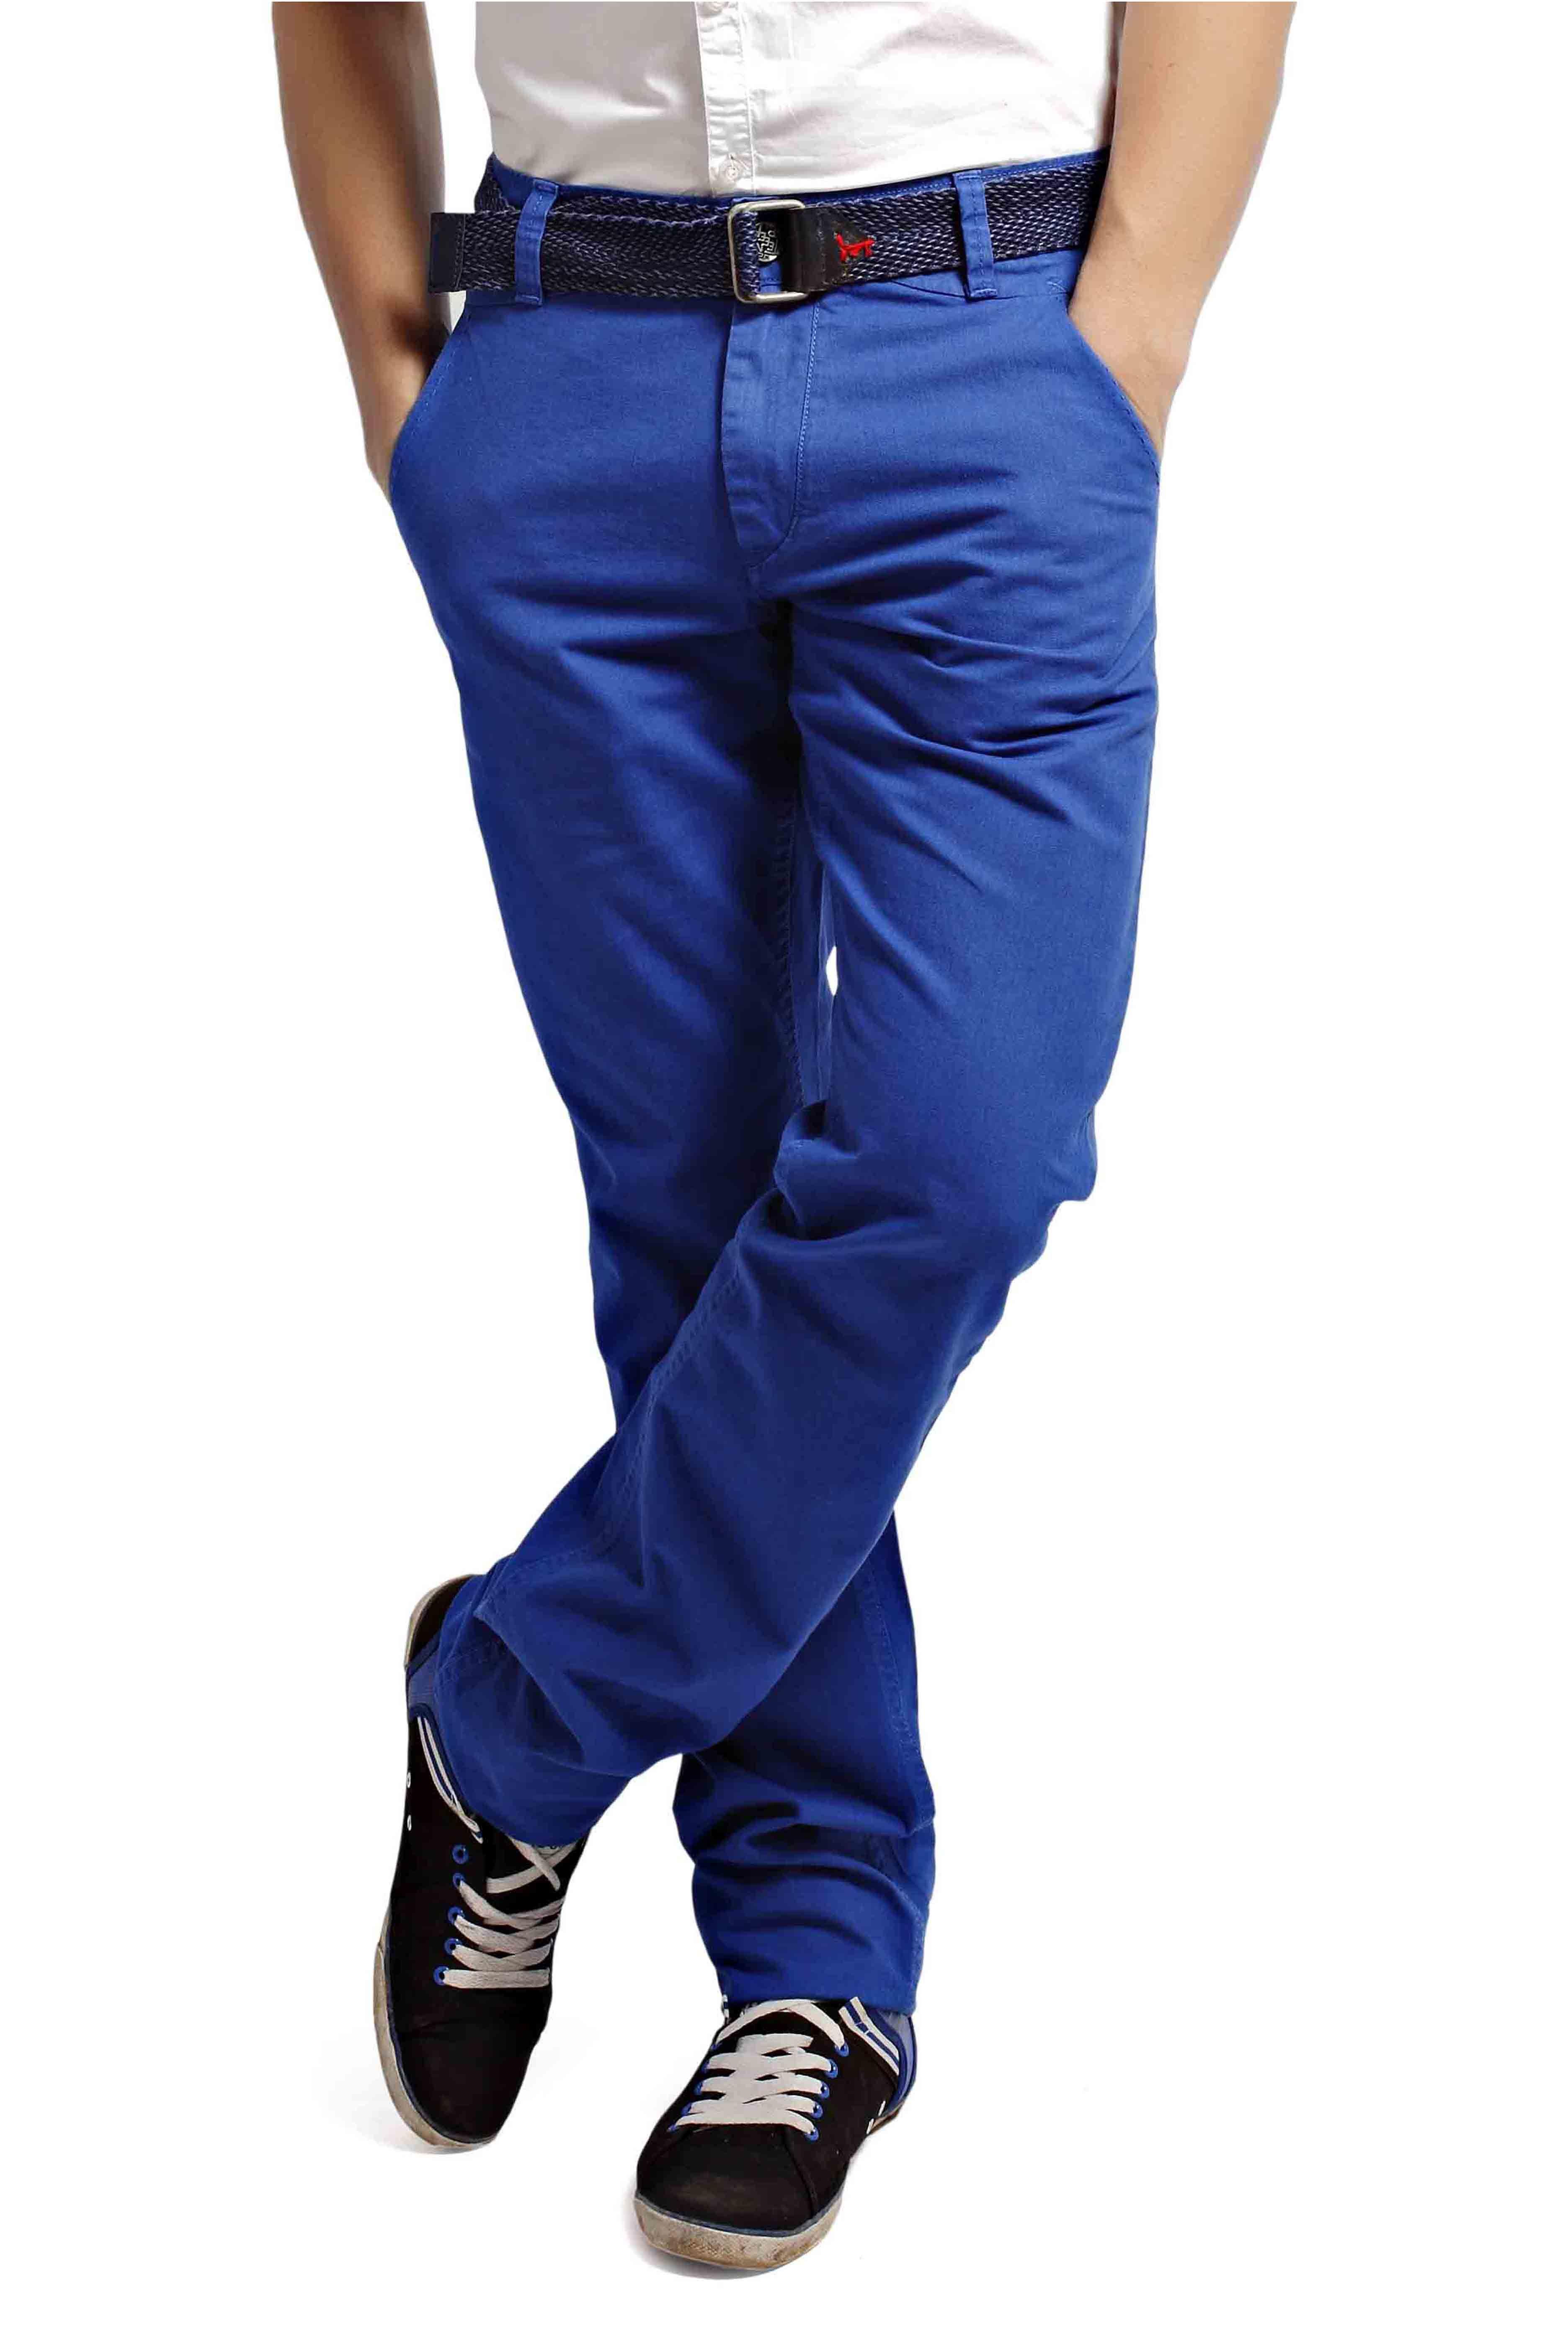 2018 New Men`s Stylish Retro Blue Patch Loose Harem Pants Men Denim Pants Taper Fit Jeans Side Striped Stripe Casual Harems Men's Clothing